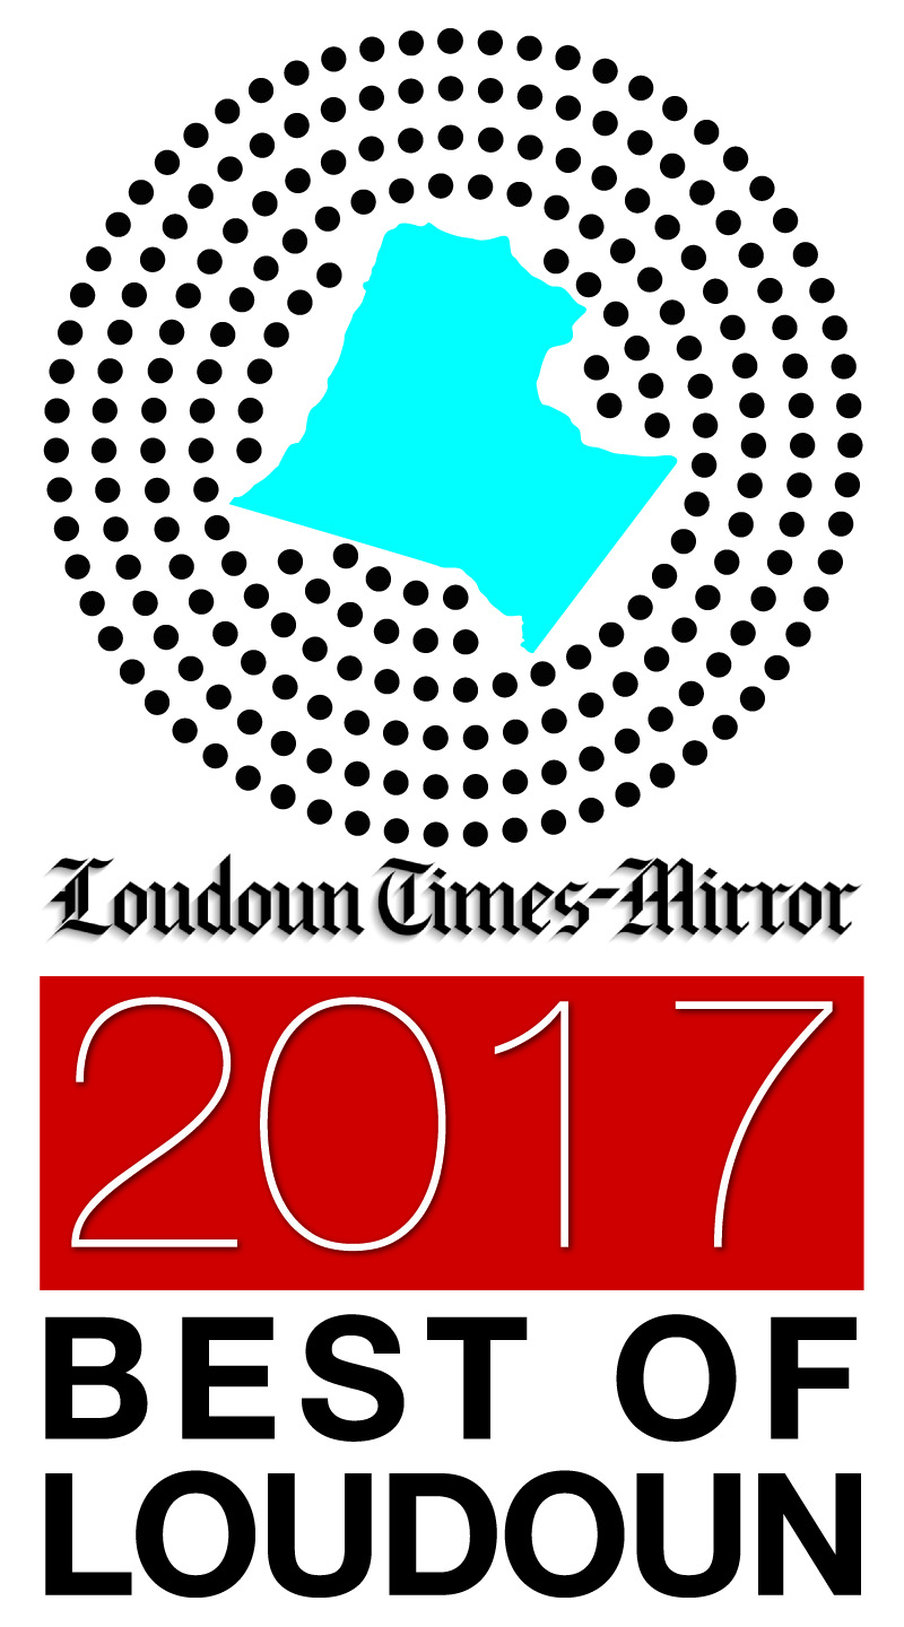 Best of Loudoun Award 2017